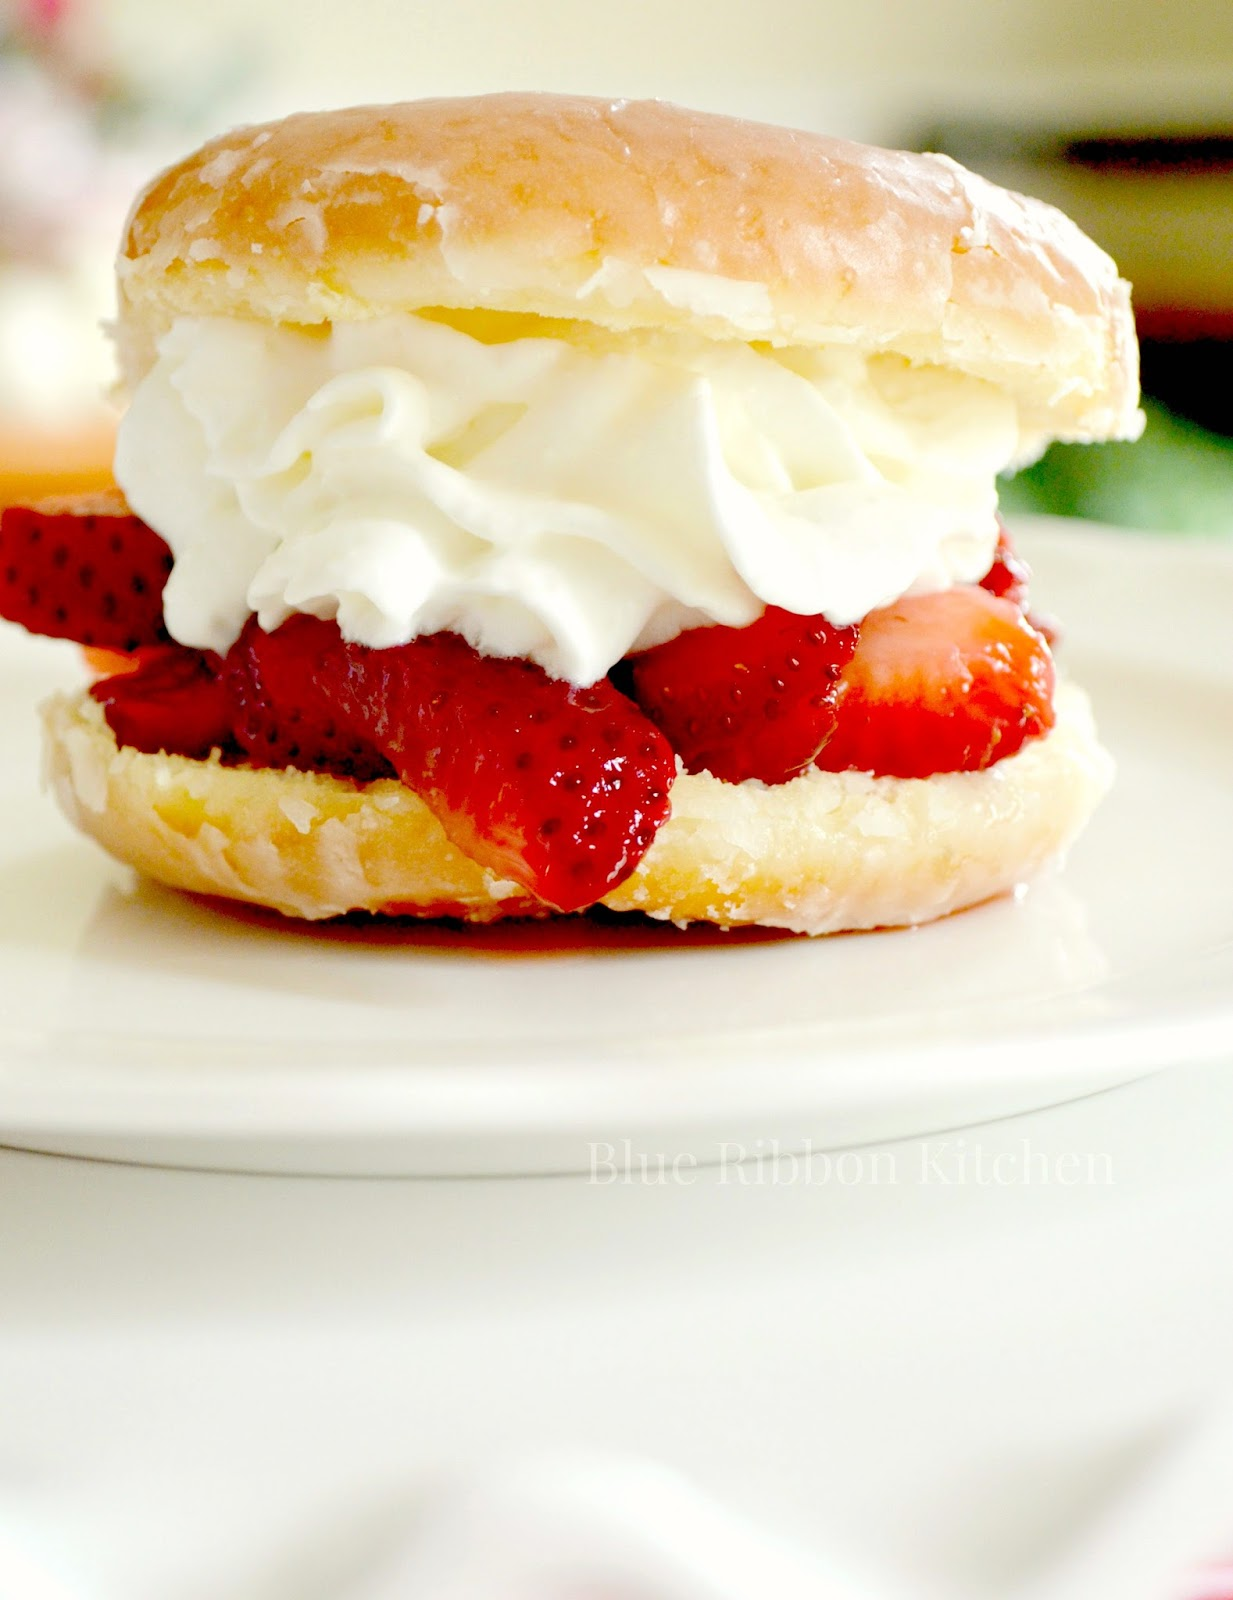 Blue Ribbon Kitchen: Strawberry Doughnut Shortcake & her sweet friend ...